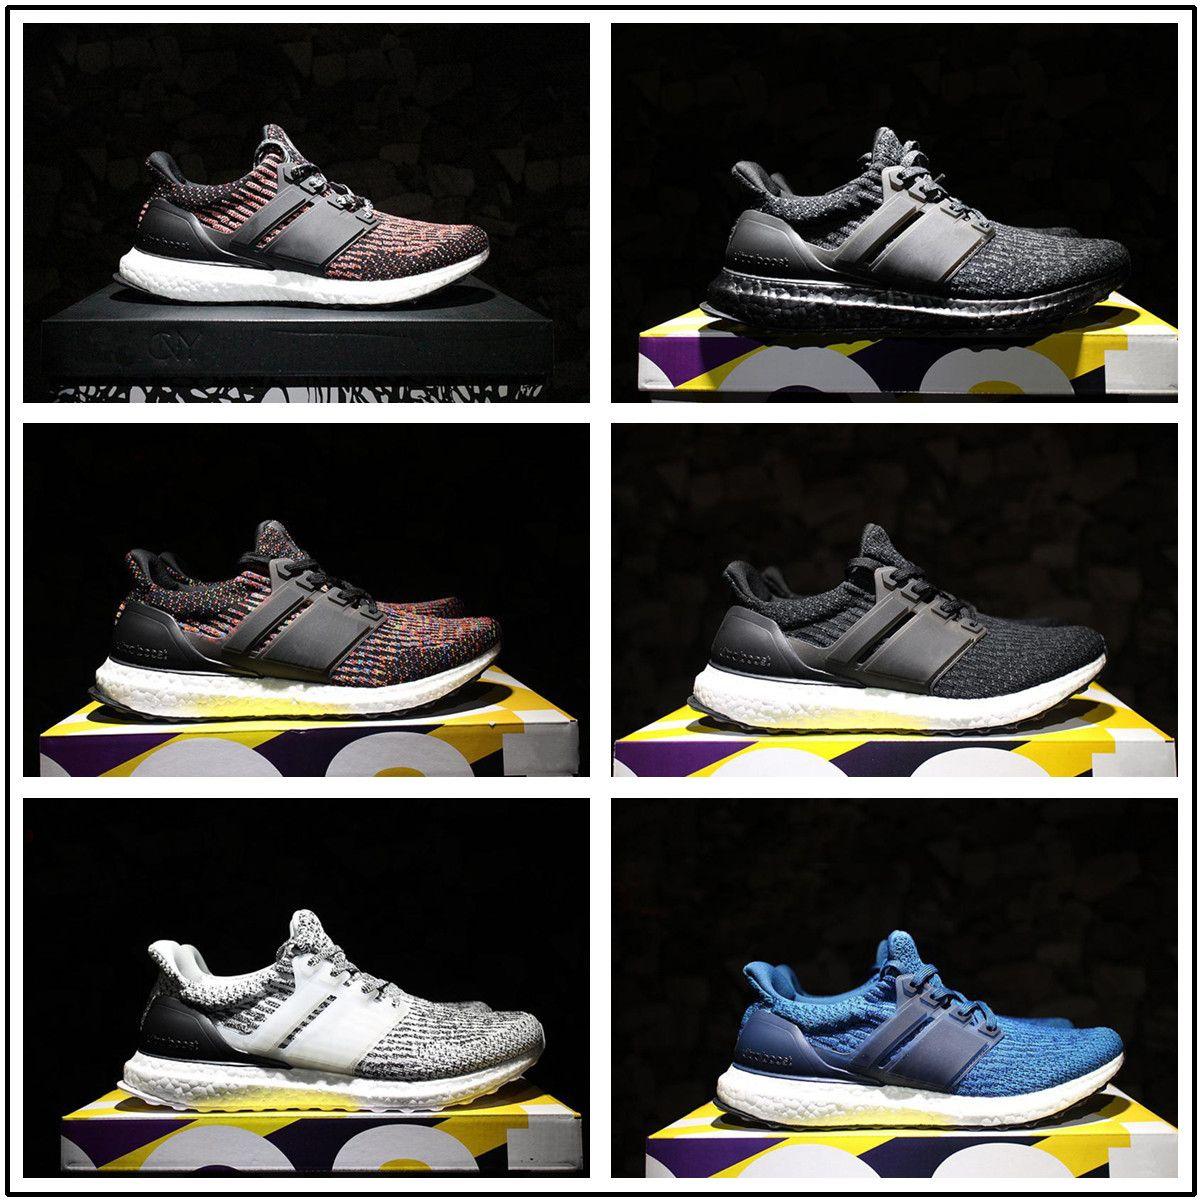 cheap for discount e6c85 2ea62 Compre Adidas Ultra Boost 3.0 2017 Nuevo Ultraboost 3.0 Zapatos Corrientes  Hombres Mujeres Alta Calidad Ultra Boost 3 Iii Blanco Negro Zapatos  Atléticos ...